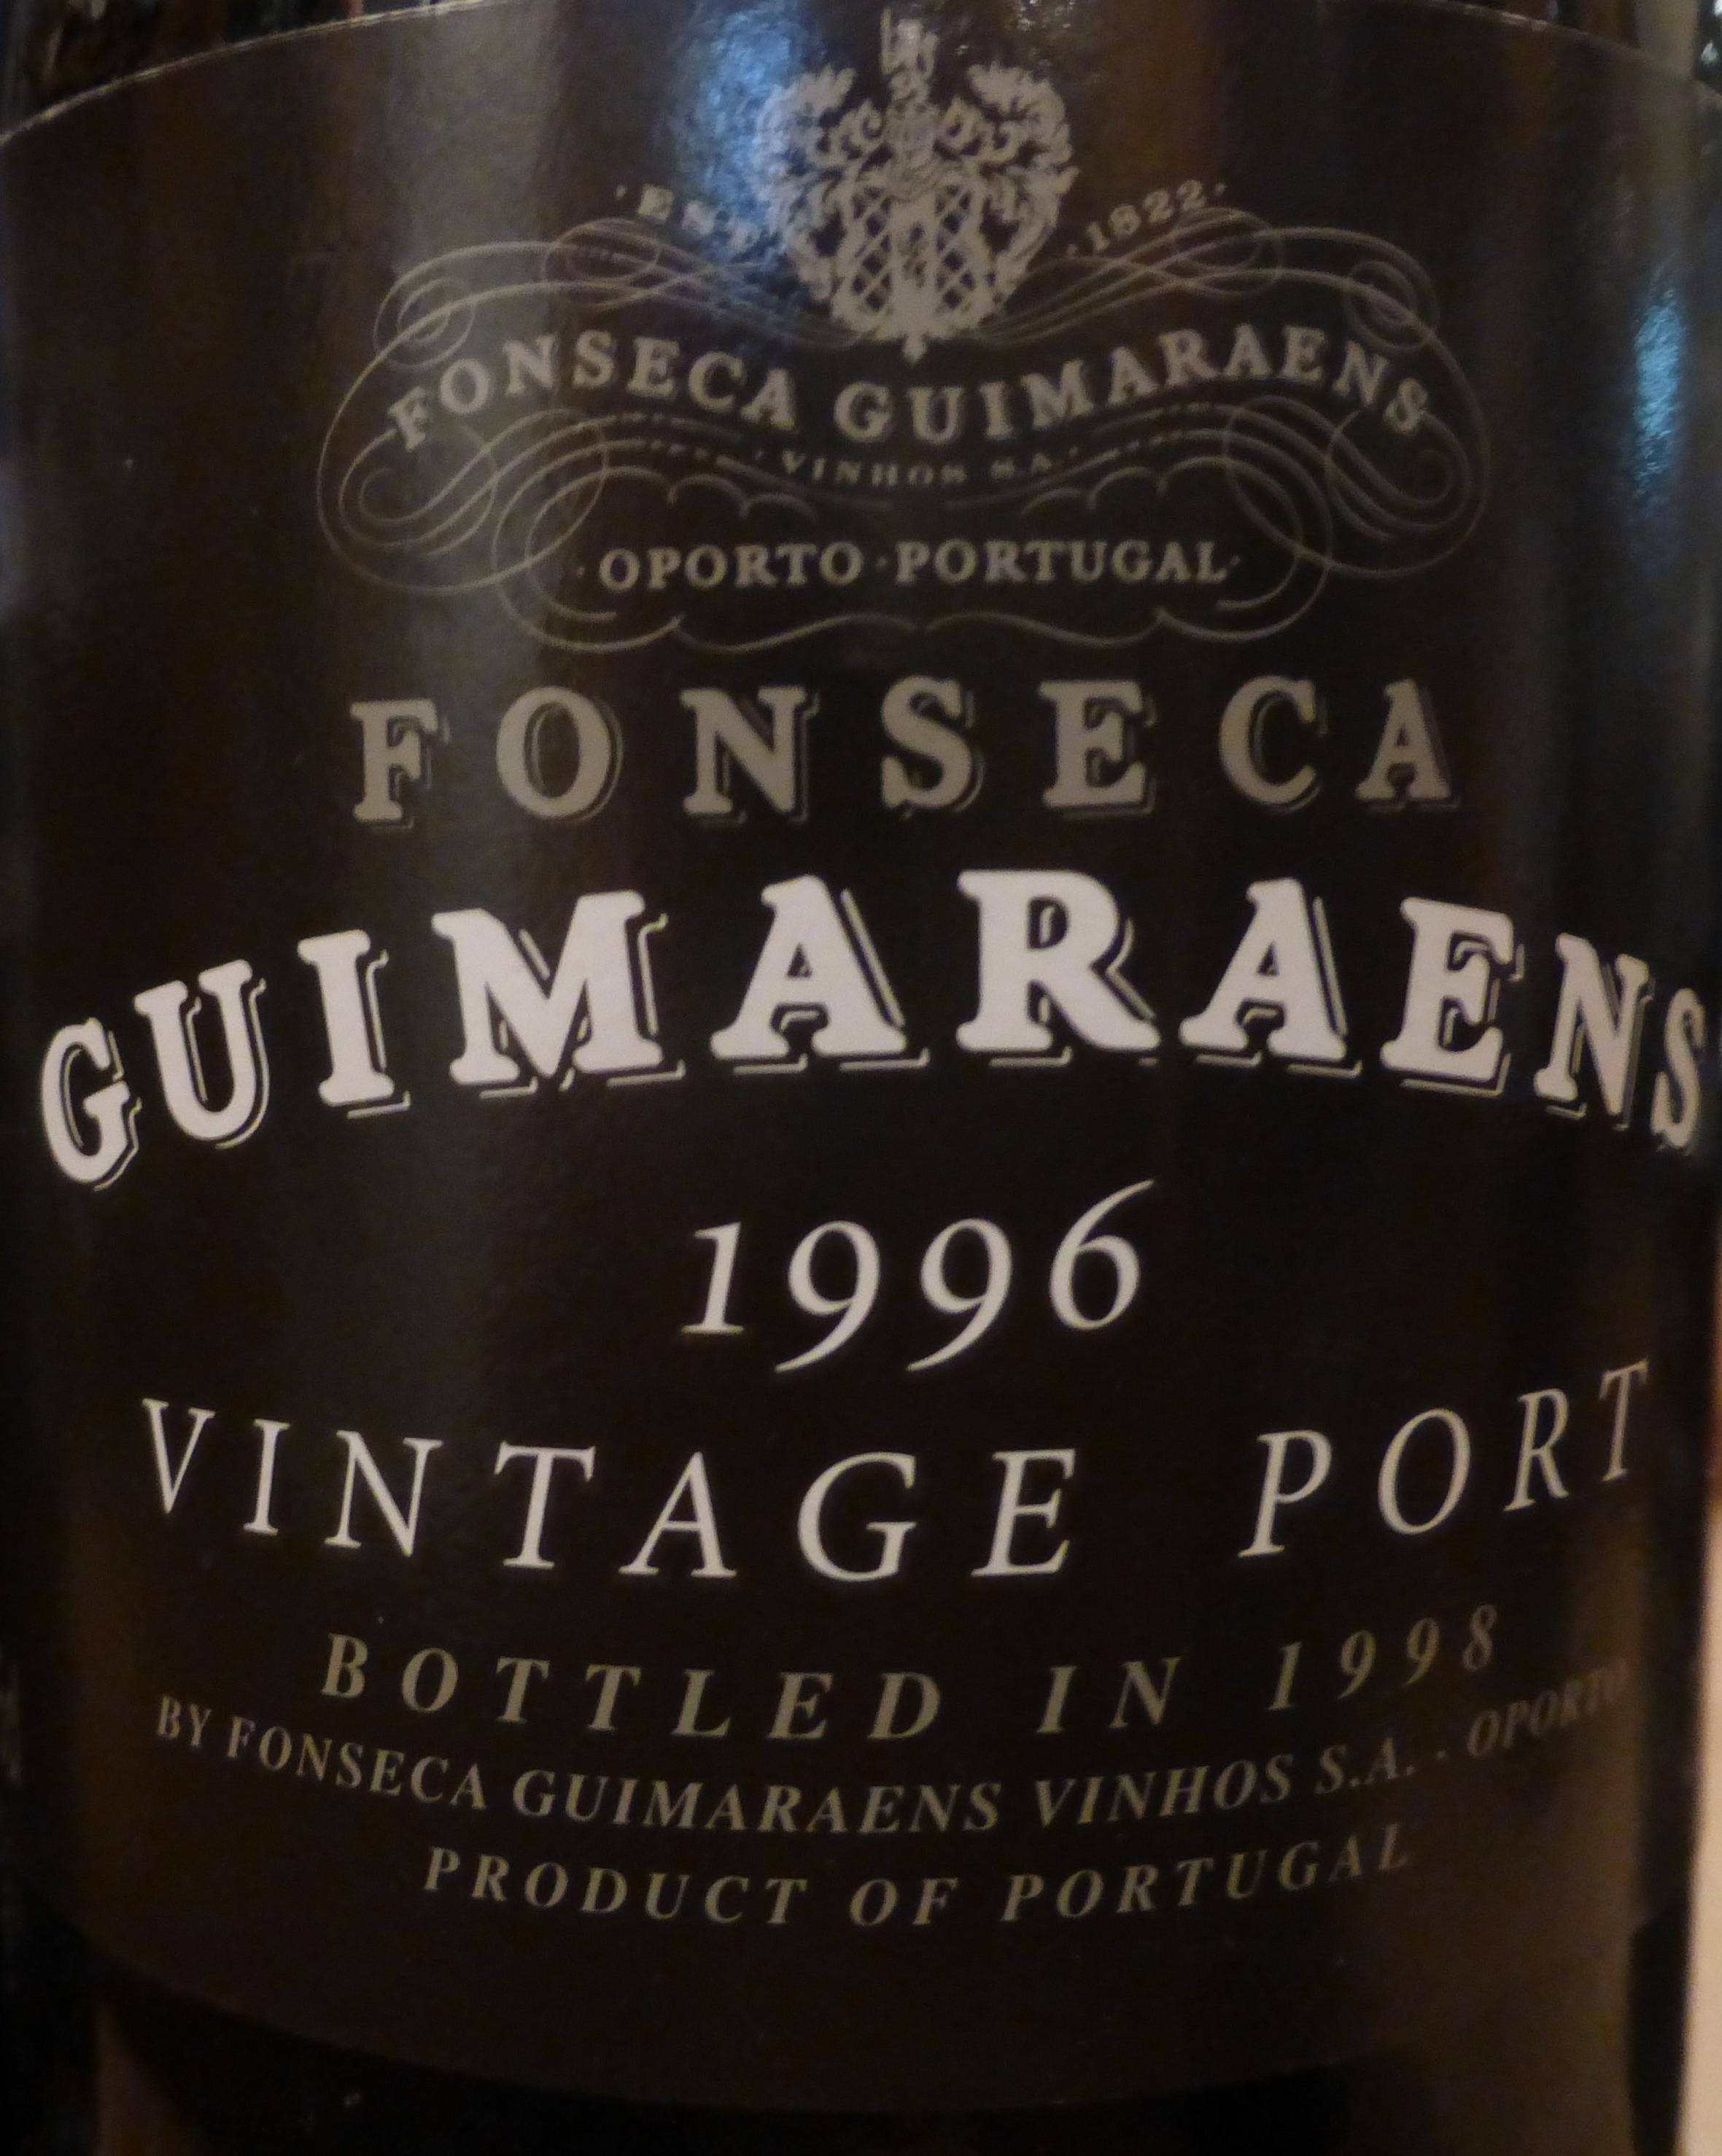 1996 Fonseca Guimaraens Vintage Port